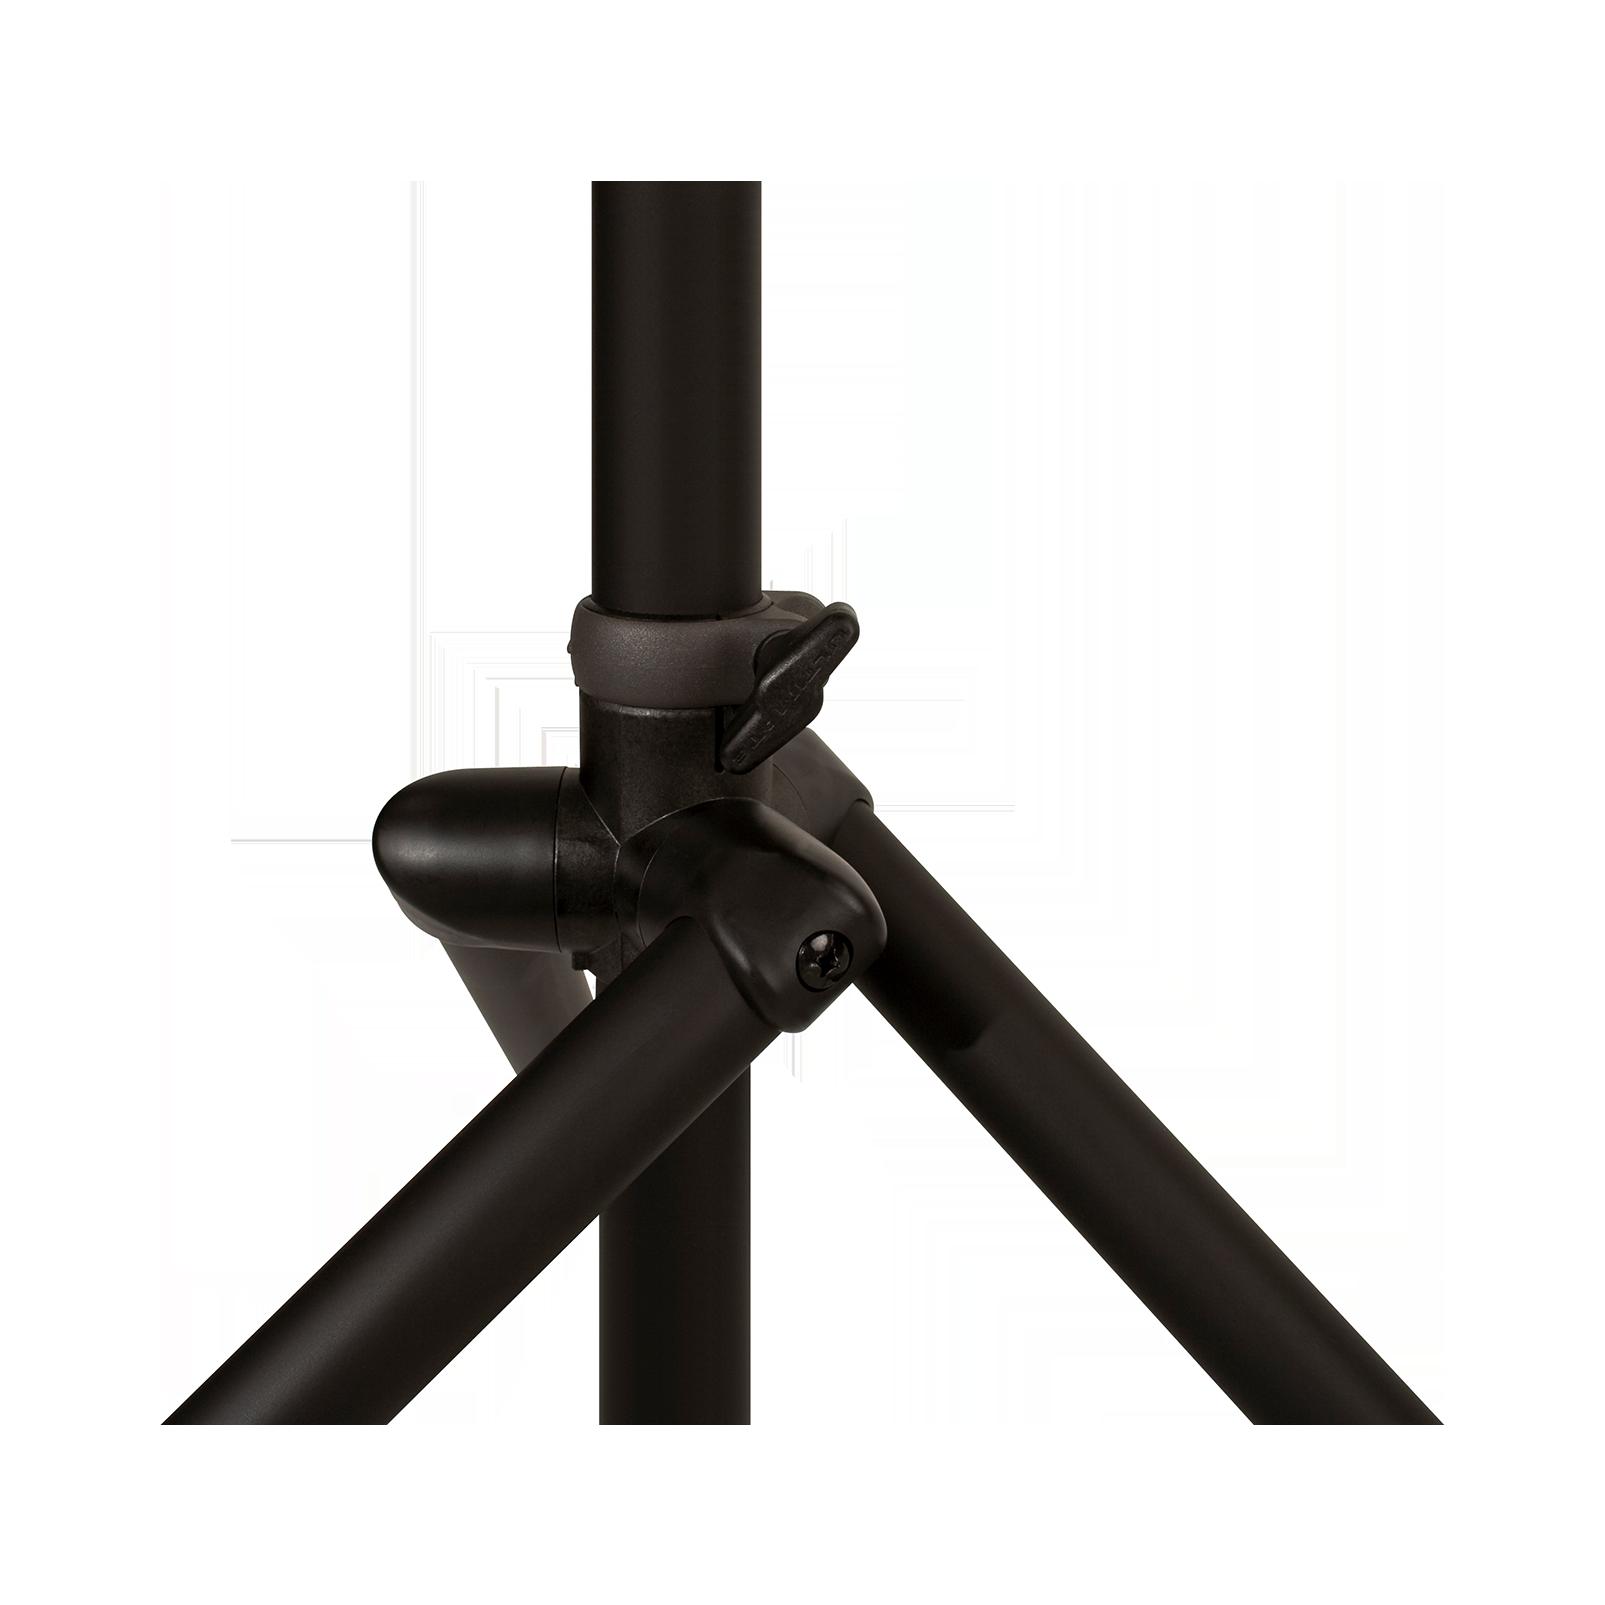 JBL Tripod Stand (Gas Assist) - Black - Lift-assist Aluminum Tripod Speaker Stand with Integrated Speaker Adapter - Detailshot 4